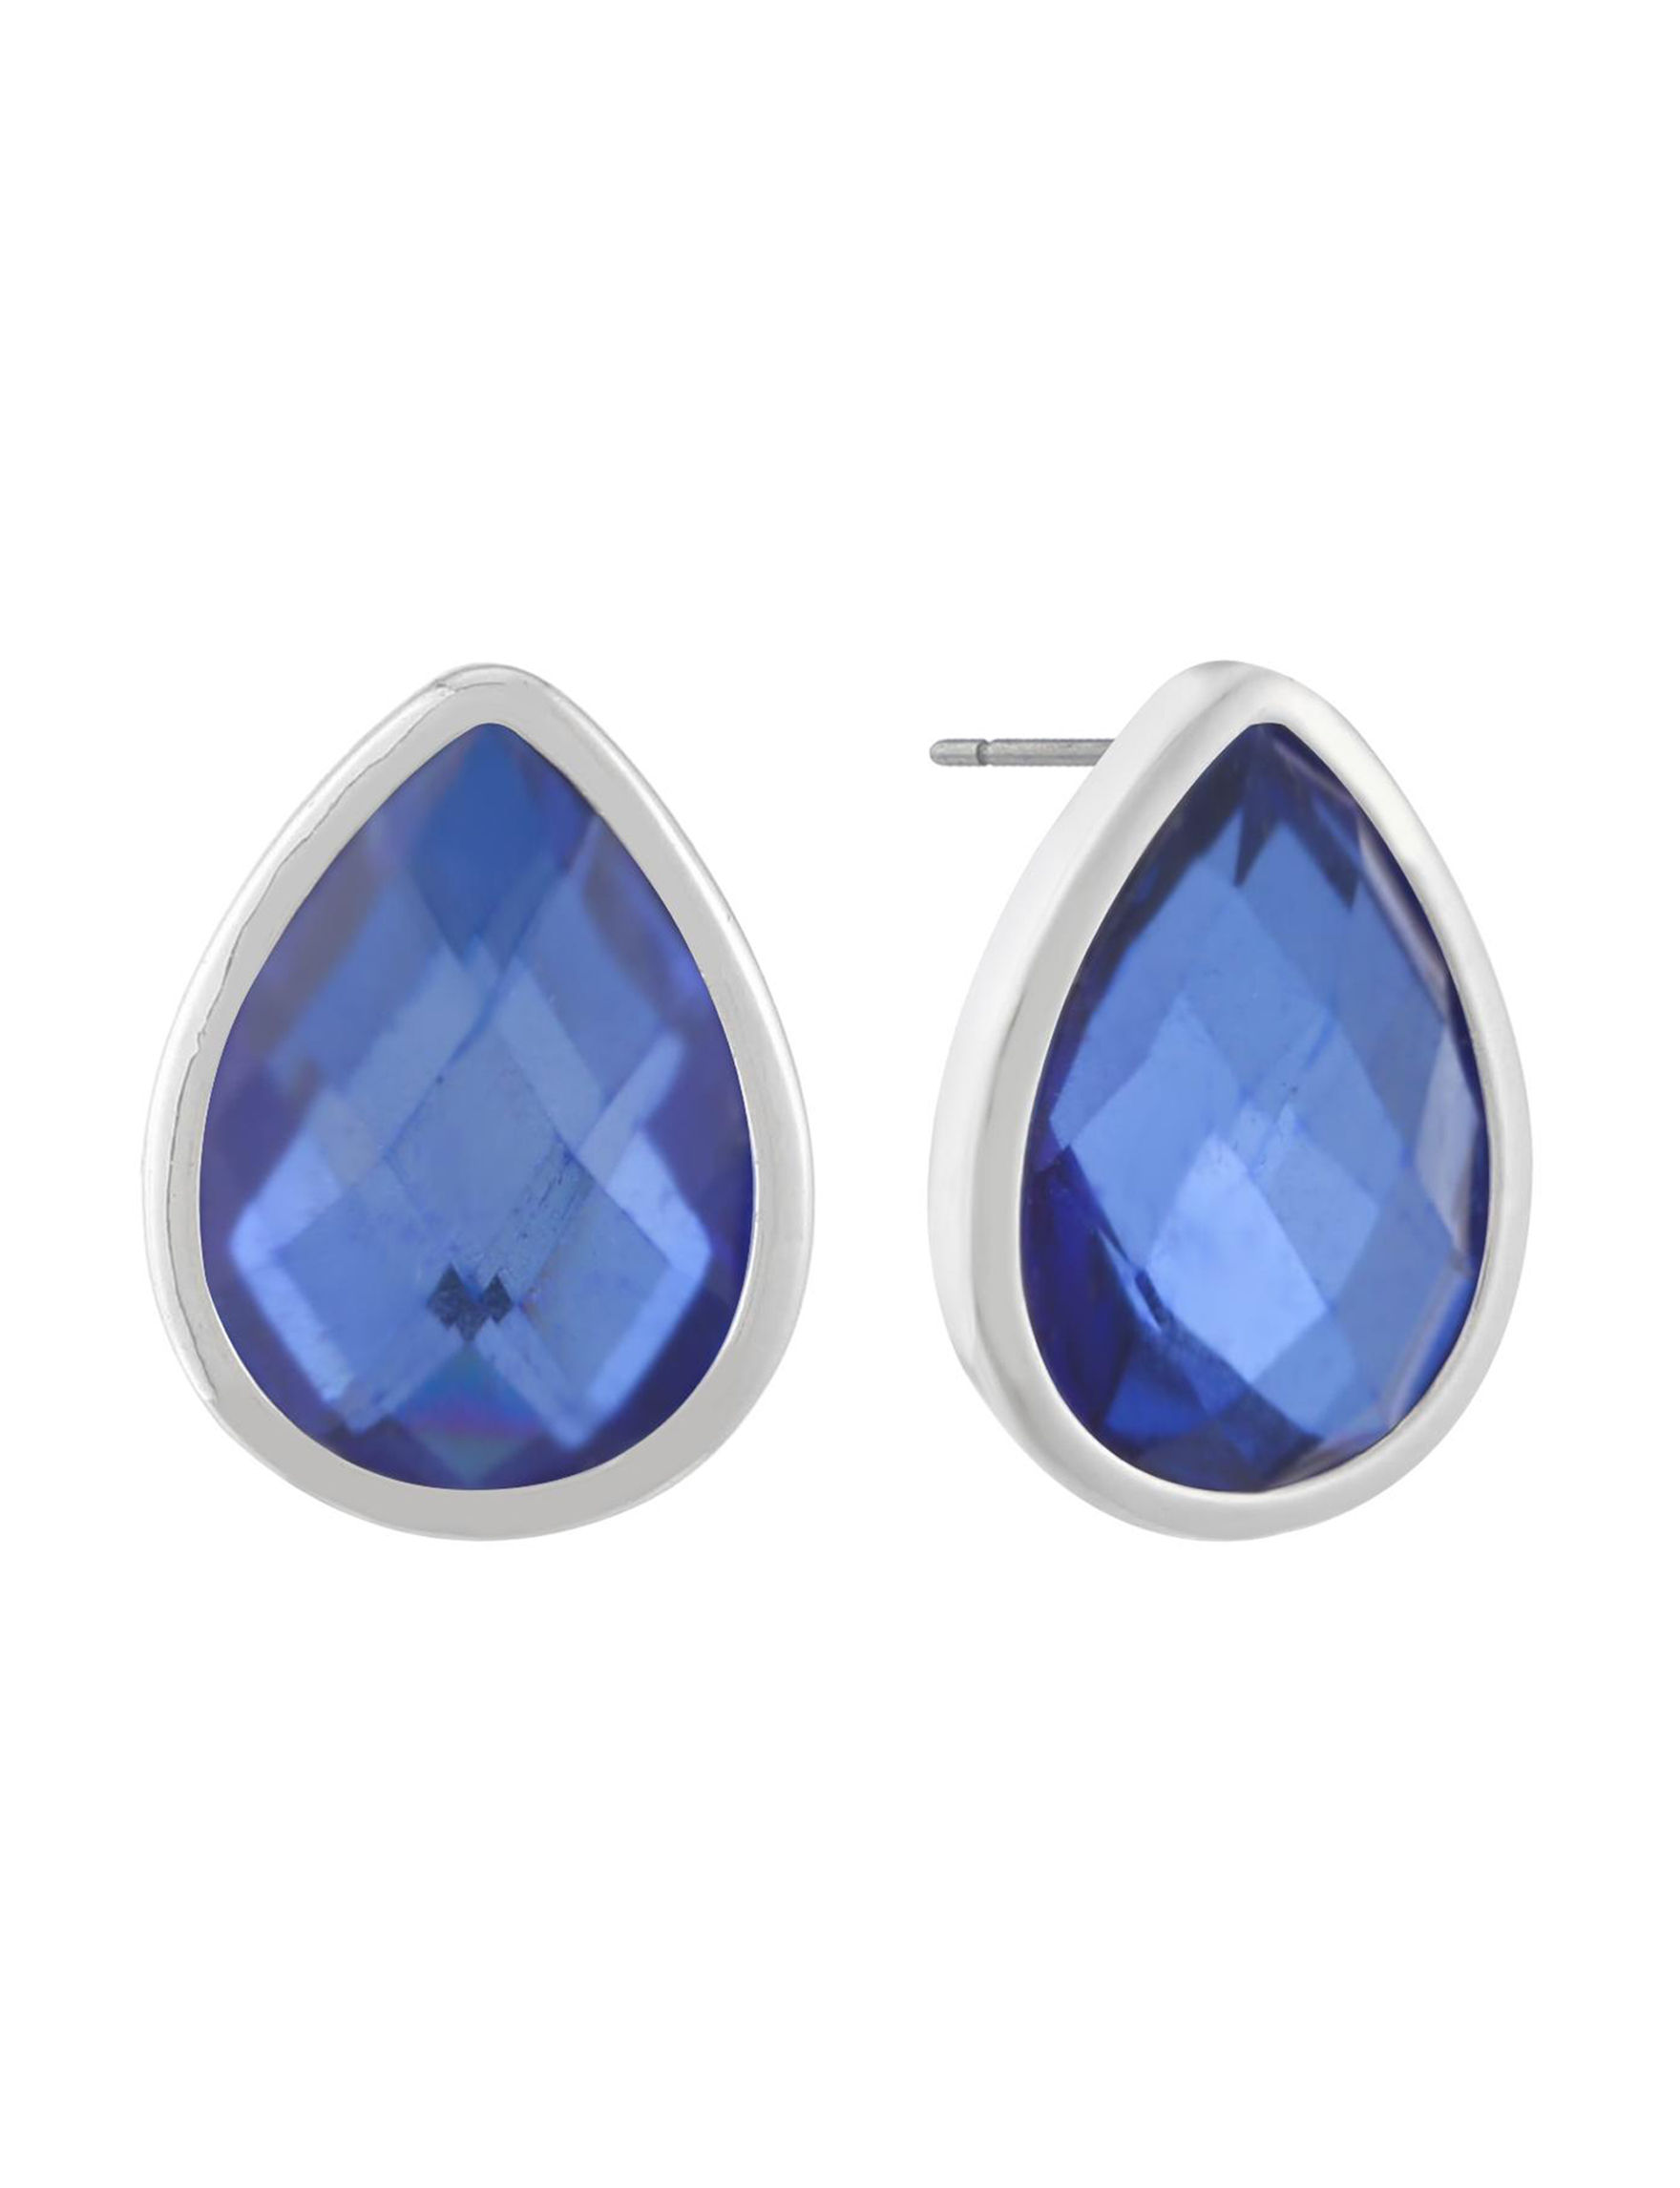 Gloria Vanderbilt Silver / Blue Stone Studs Earrings Fashion Jewelry